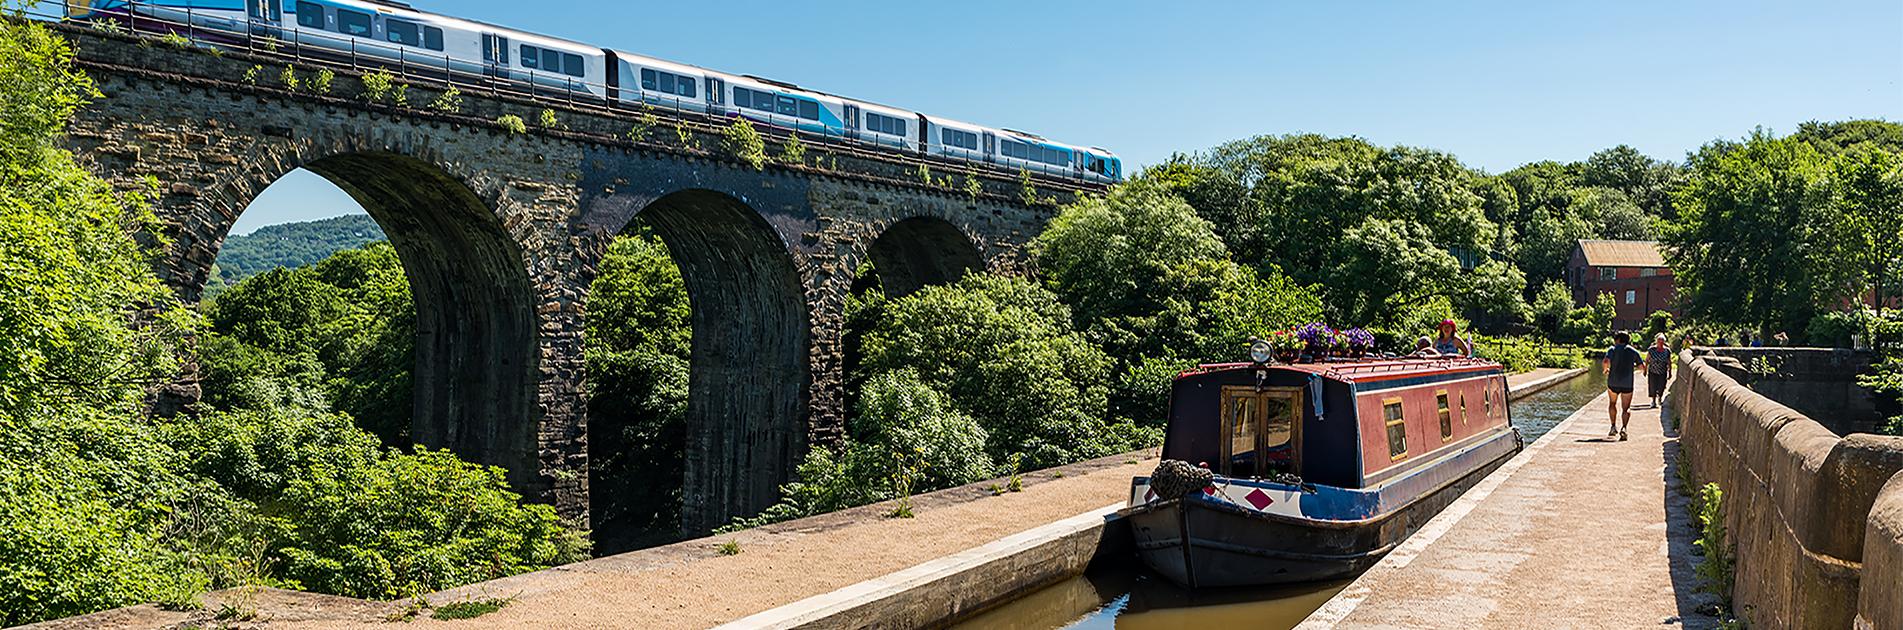 Narrowboat ved bro nær Manchester